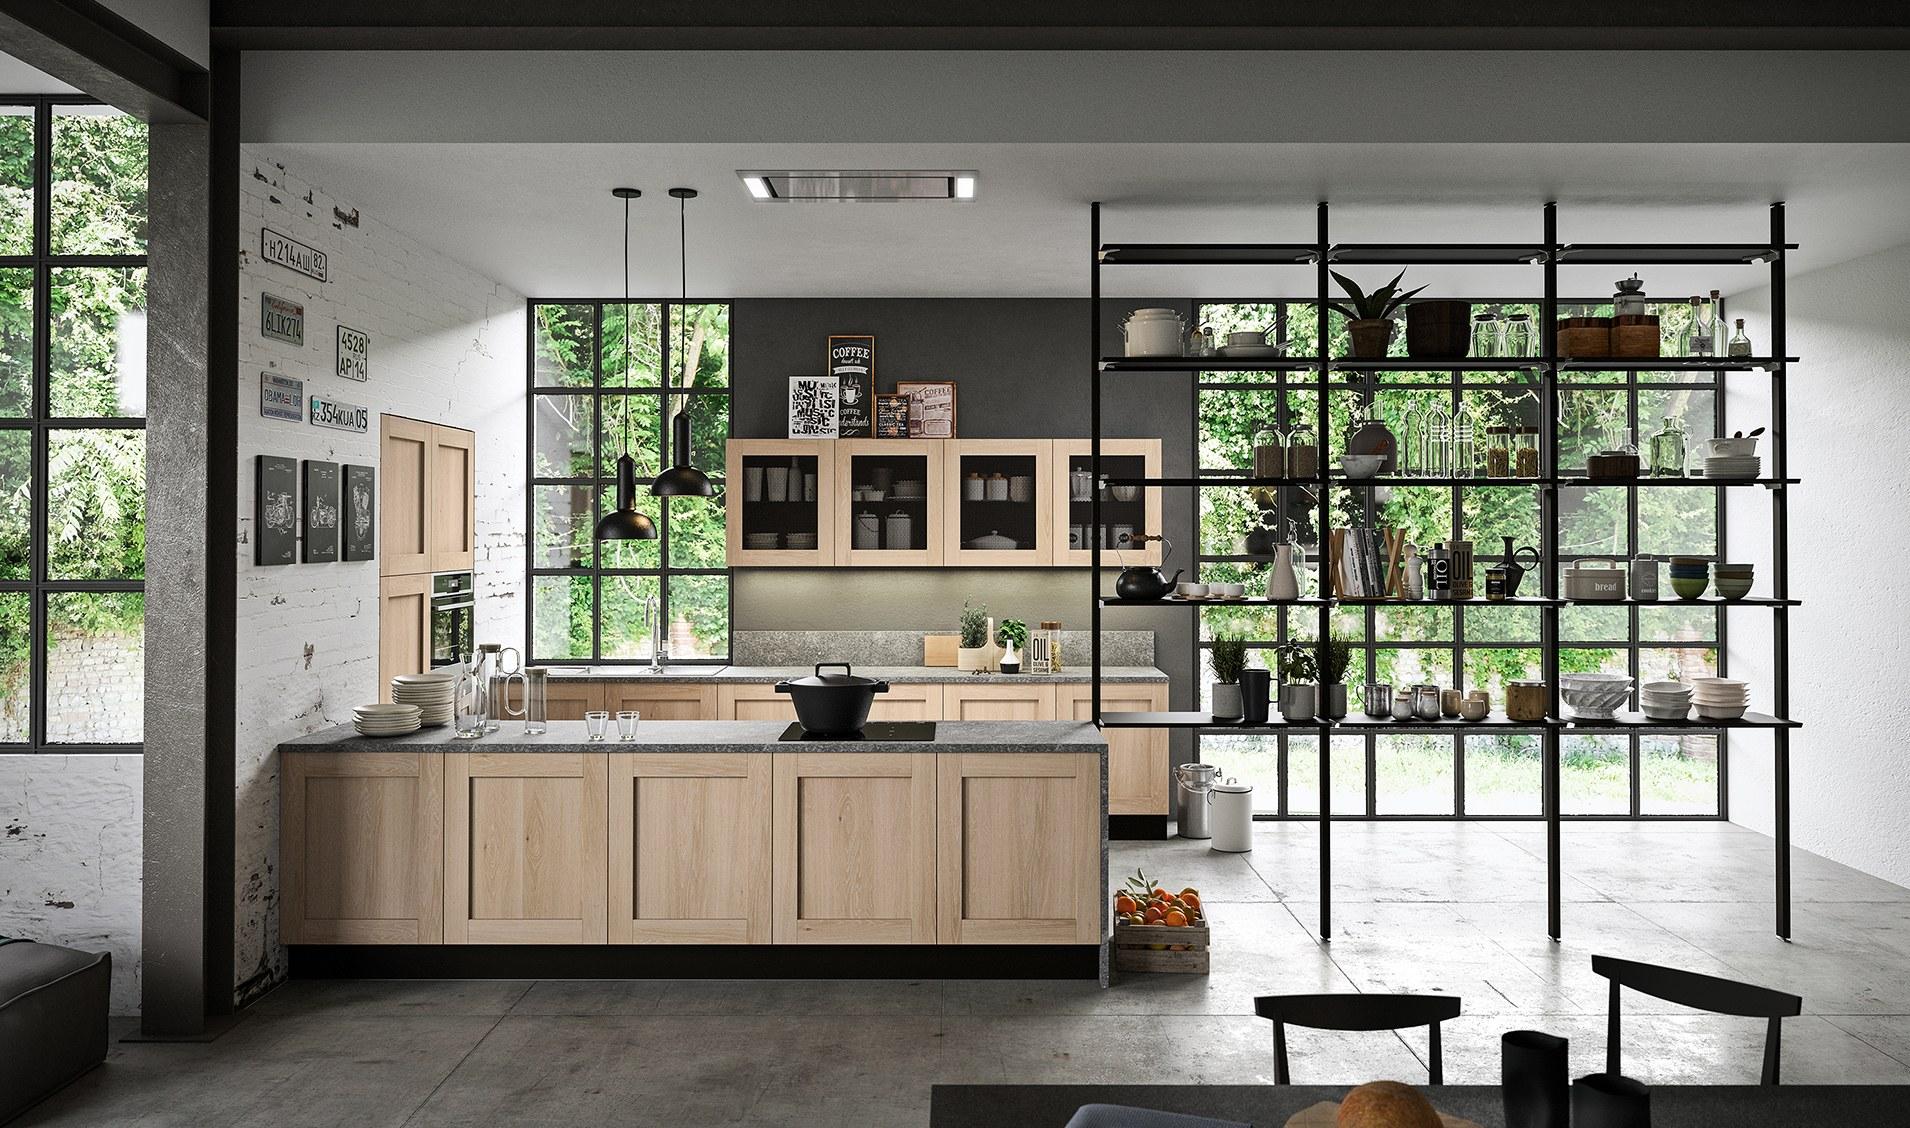 Cucina moderna Aran Licia: fra tradizione innovazione